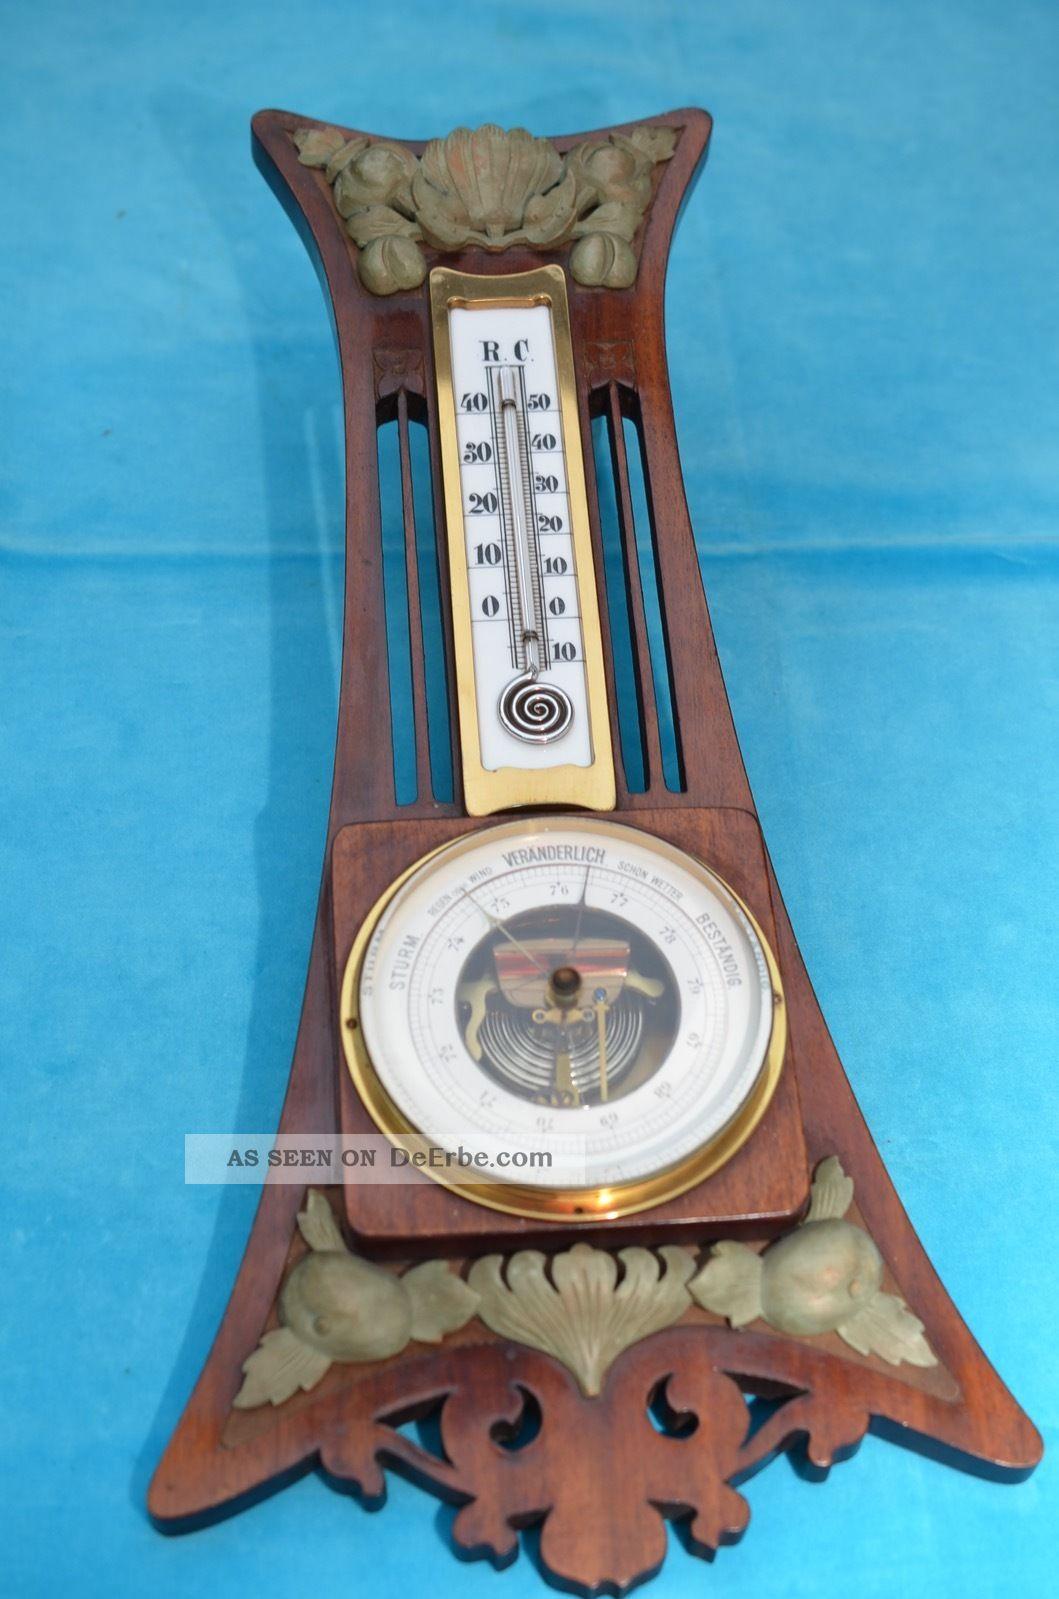 Altes Schönes Jugendstil Thermometer Mit Barometer Um 1900/1910 Technik & Instrumente Bild